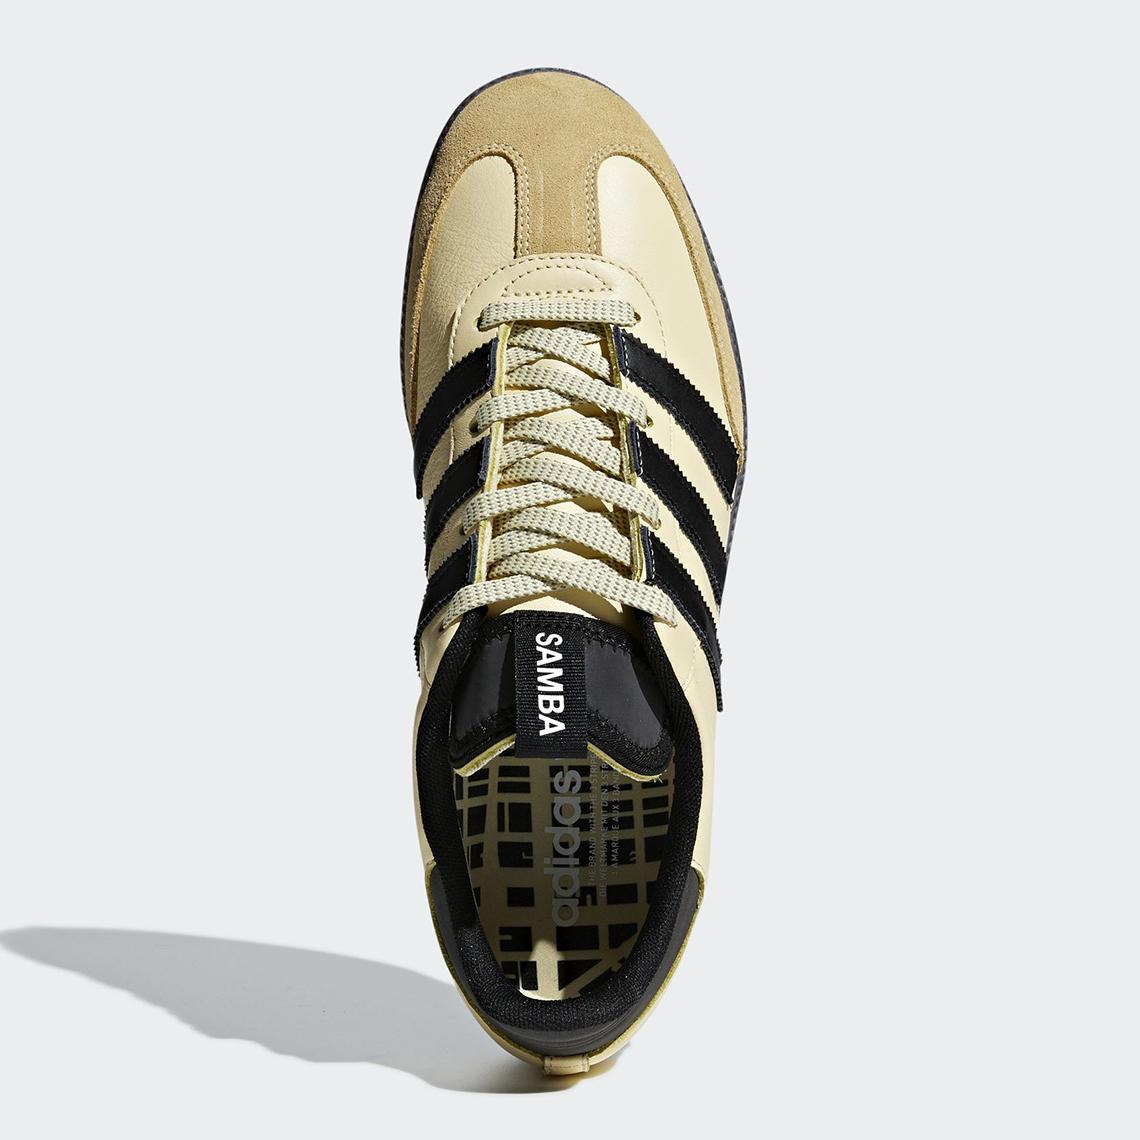 e7f7aed461 adidas Samba OG MS Black Yellow BD7523 + BD7541 Store List ...